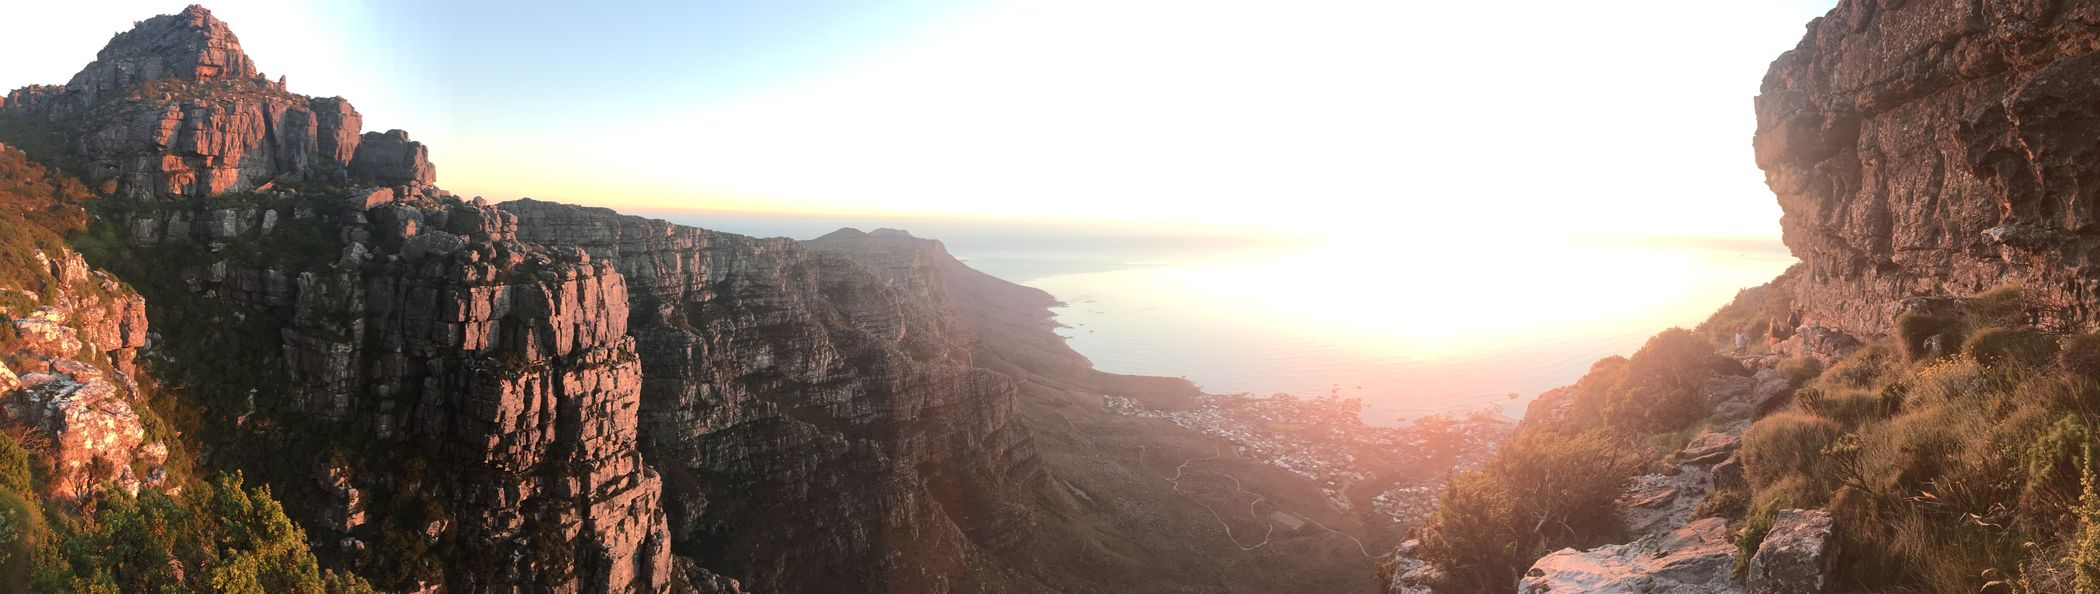 Tablemountain Tafelberg South Africa Original Panorama Sunset